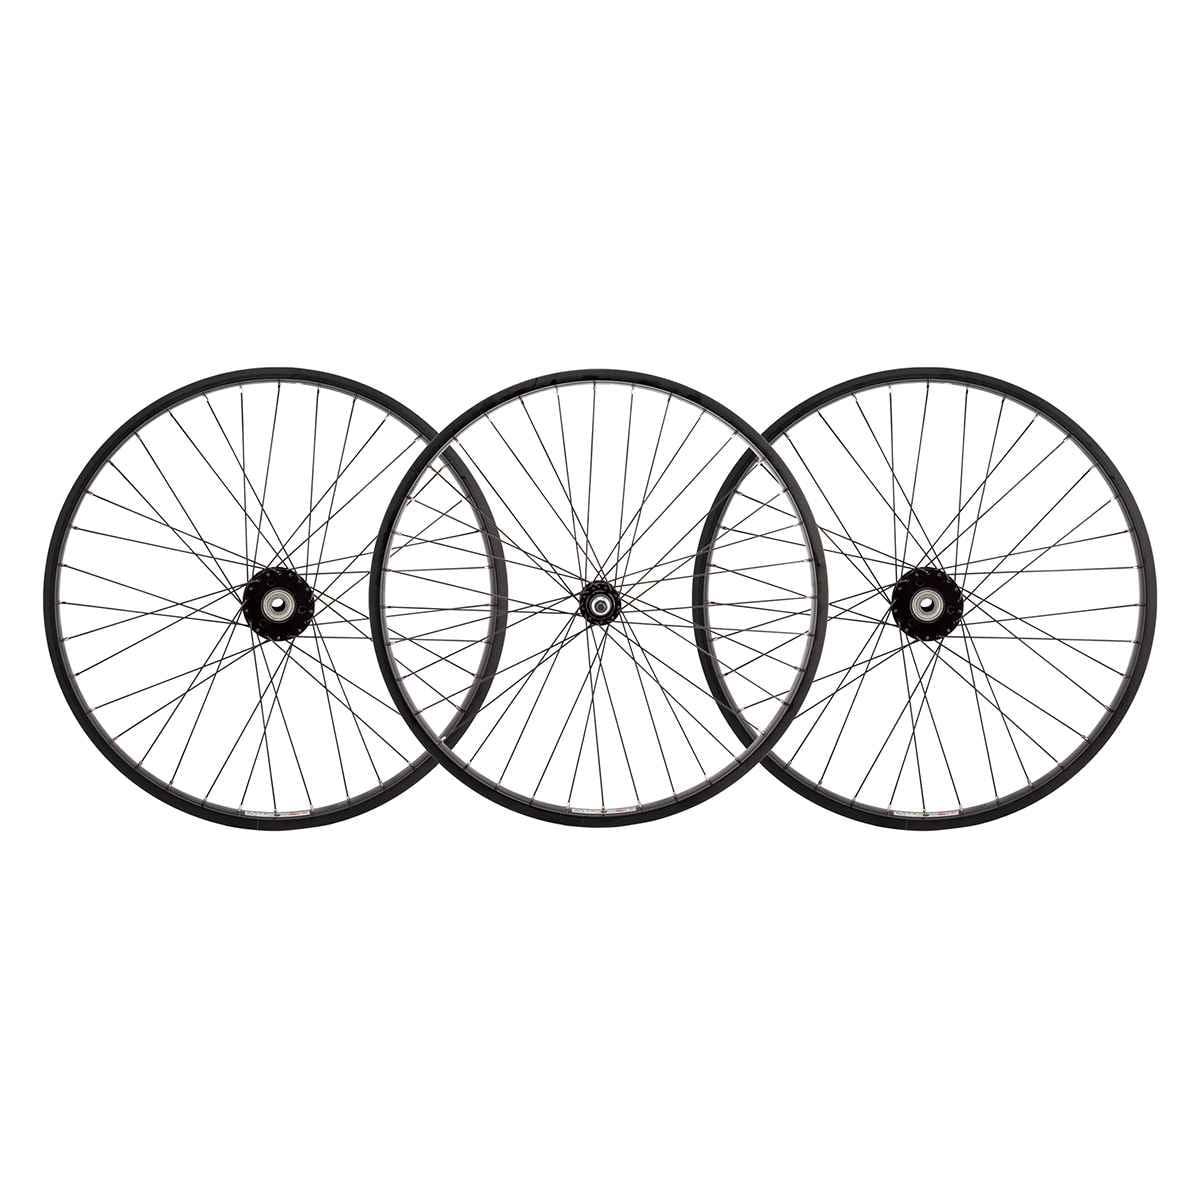 Wheel Masters Spoke Bulk Cn Stl Ucp 2.0 294